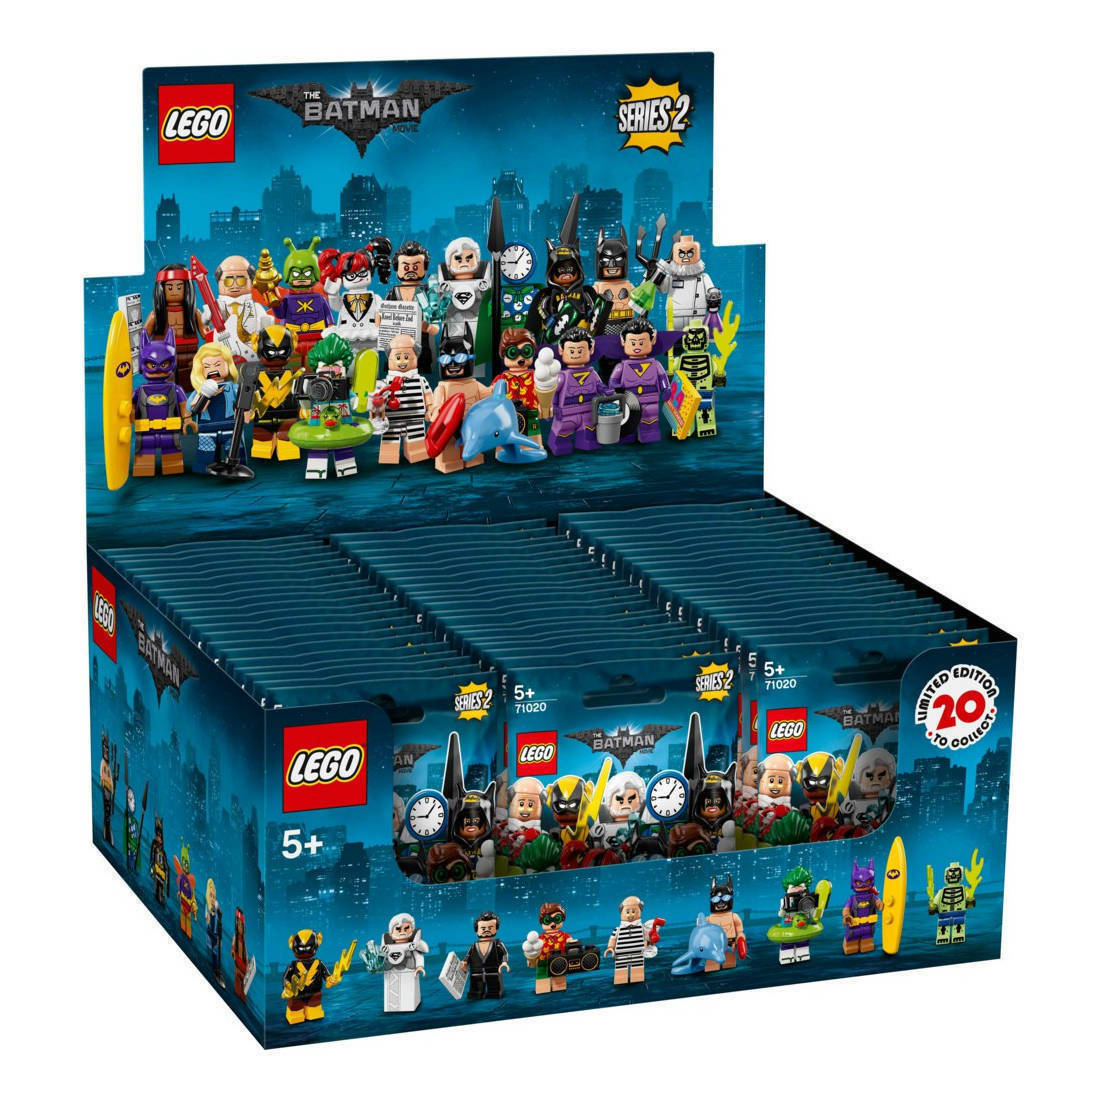 71020 LEGO® Minifiguren - Serie 2 Batman (BOX á 60 Stück) display